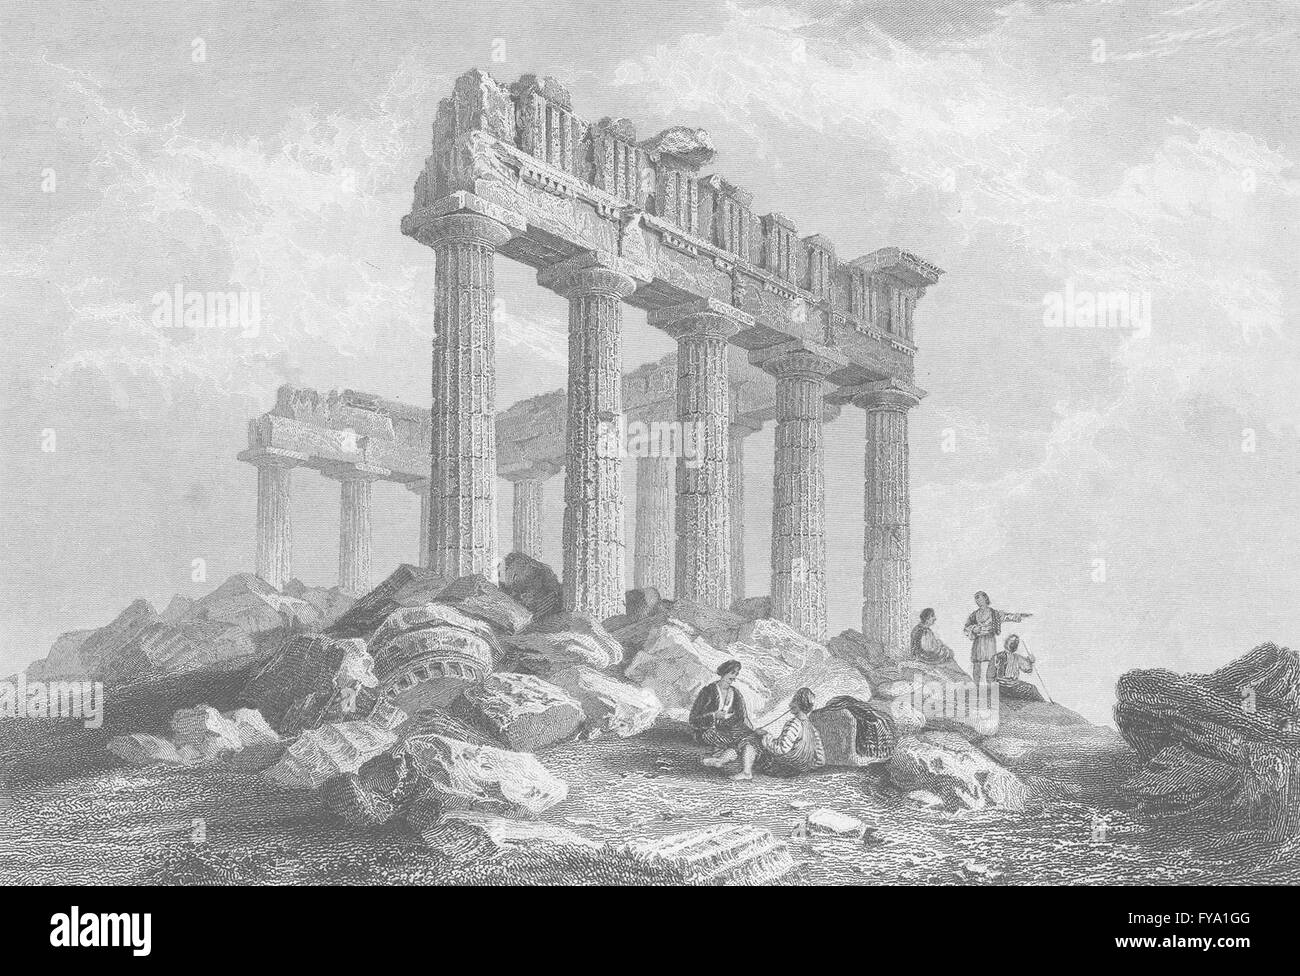 GREECE: The Parthenon ; Finden, antique print 1834 - Stock Image